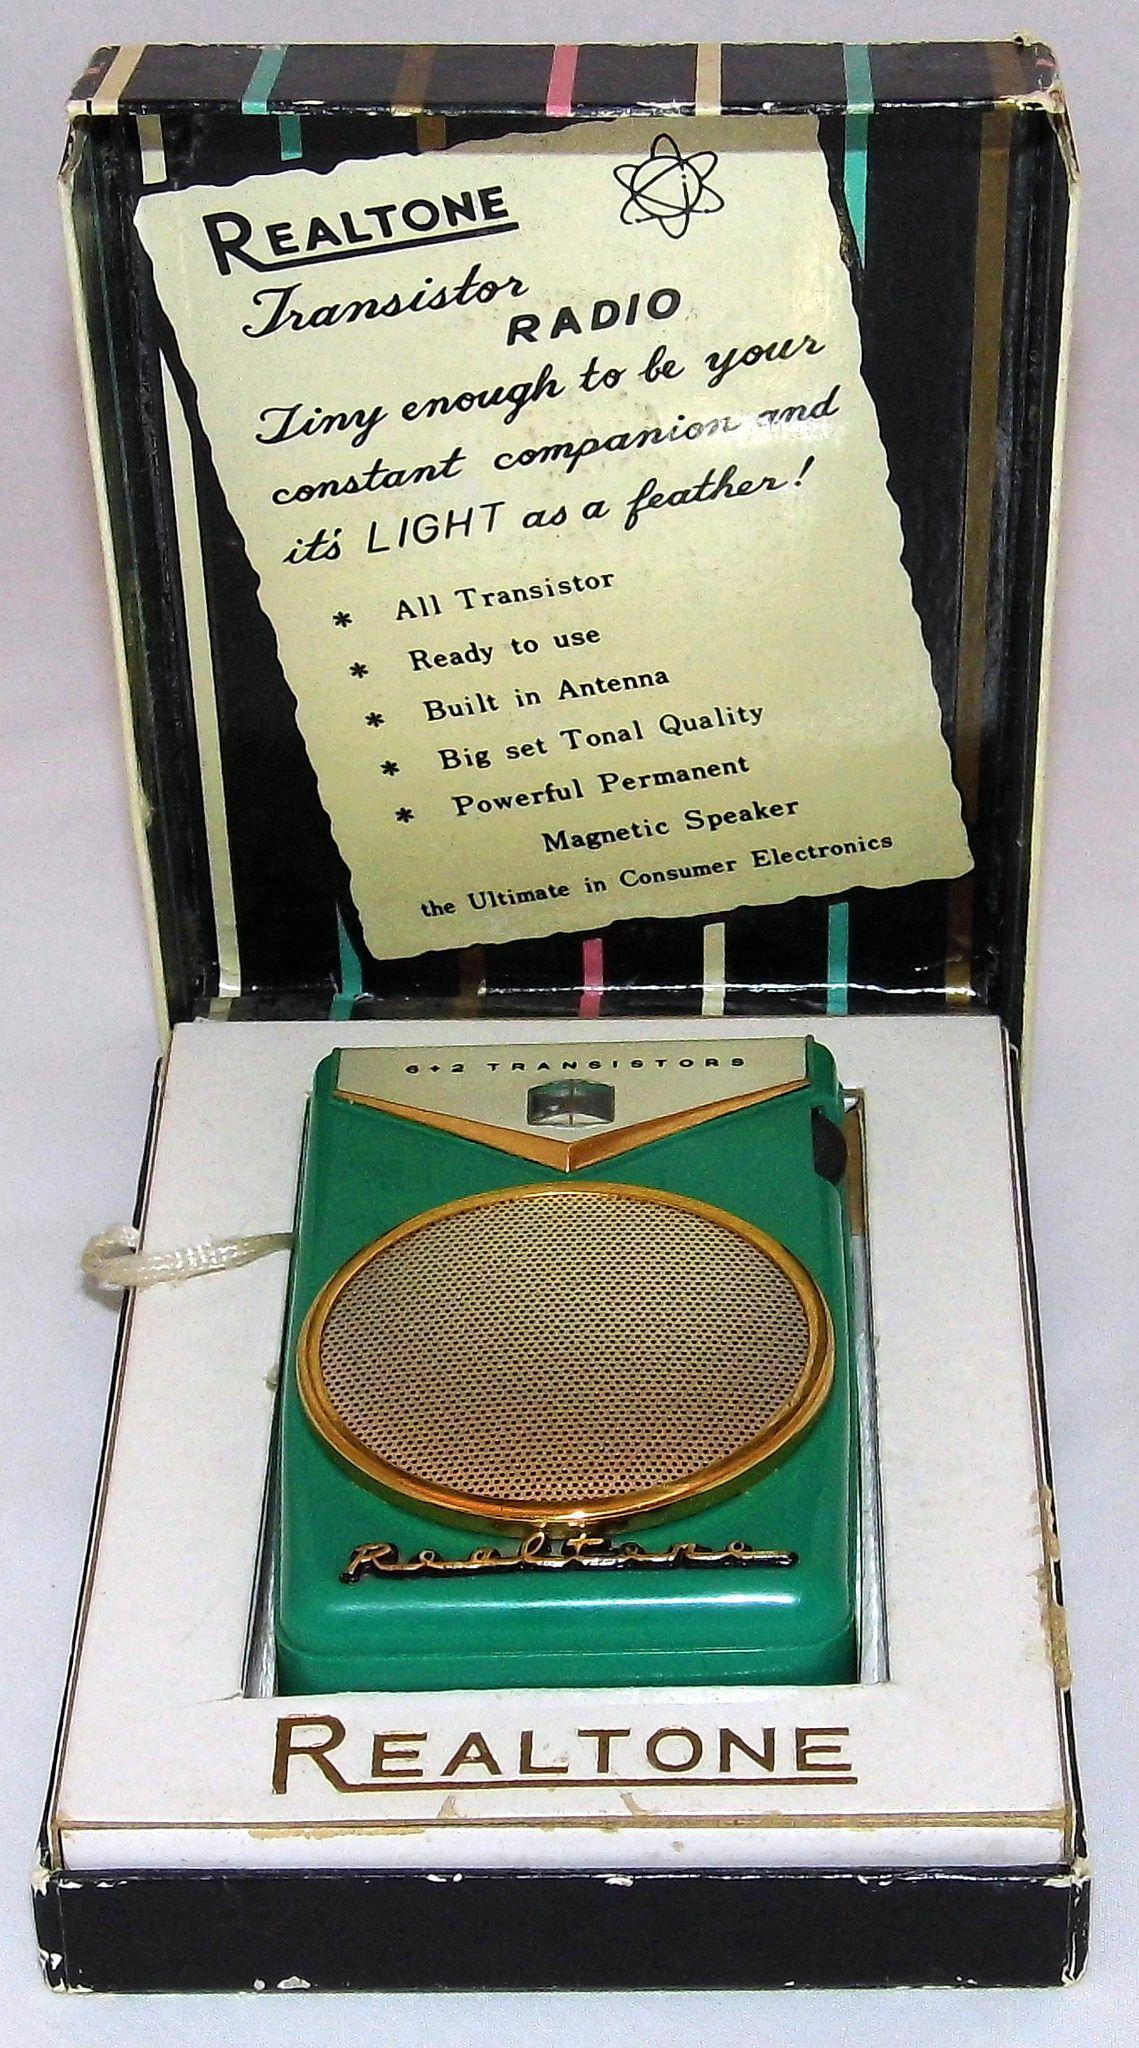 Vintage Realtone Transistor Radio Model Tr 801 Am Band 6 Transistors Made In Japan Circa 1959 Transistor Radio Vintage Vintage Radio Antique Radio